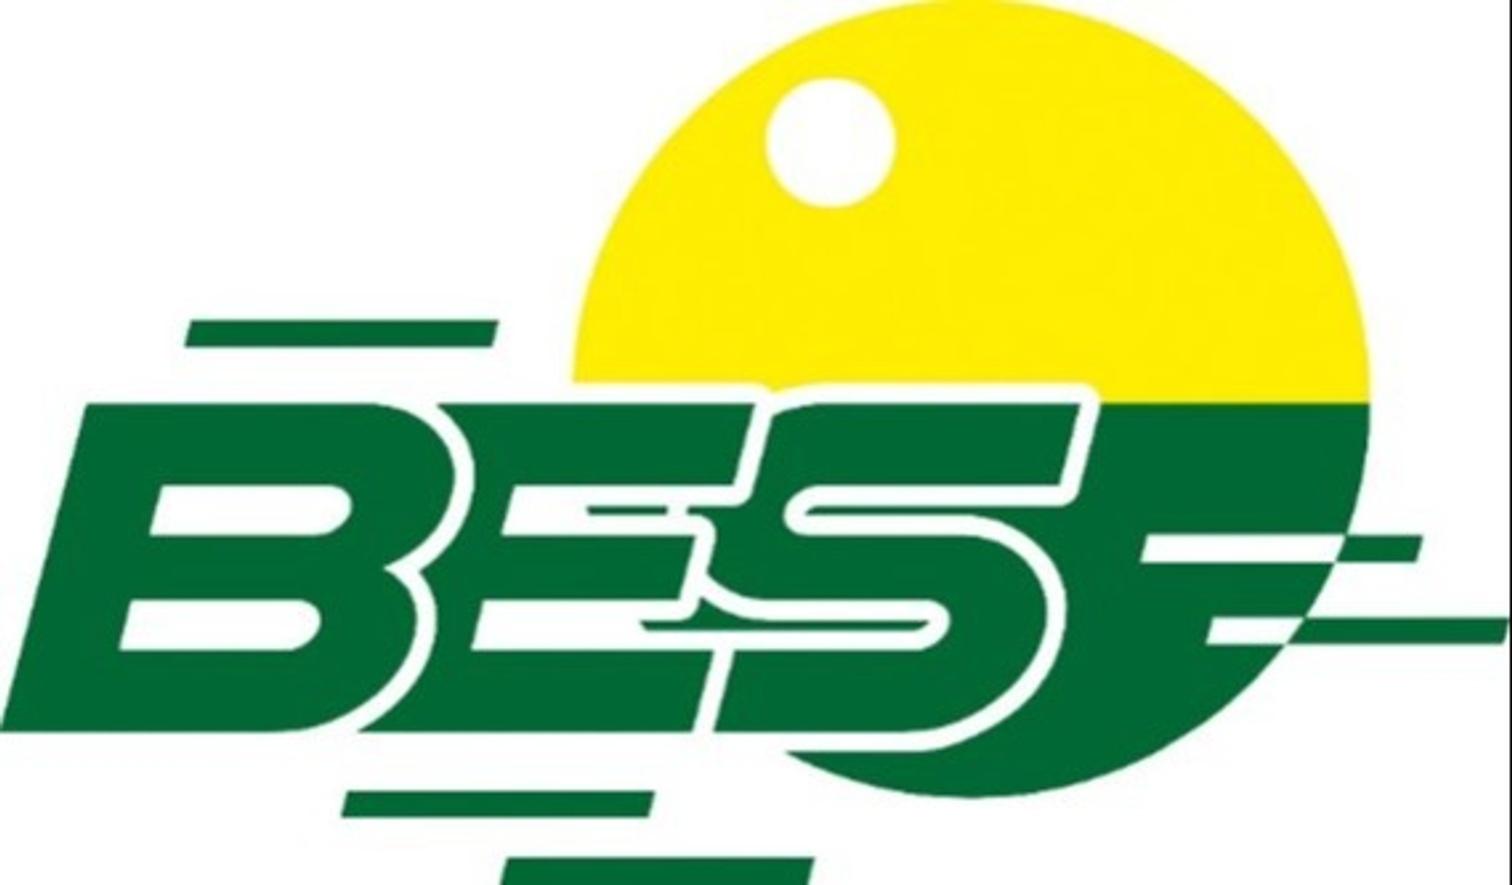 logo Belgian Energy Systems